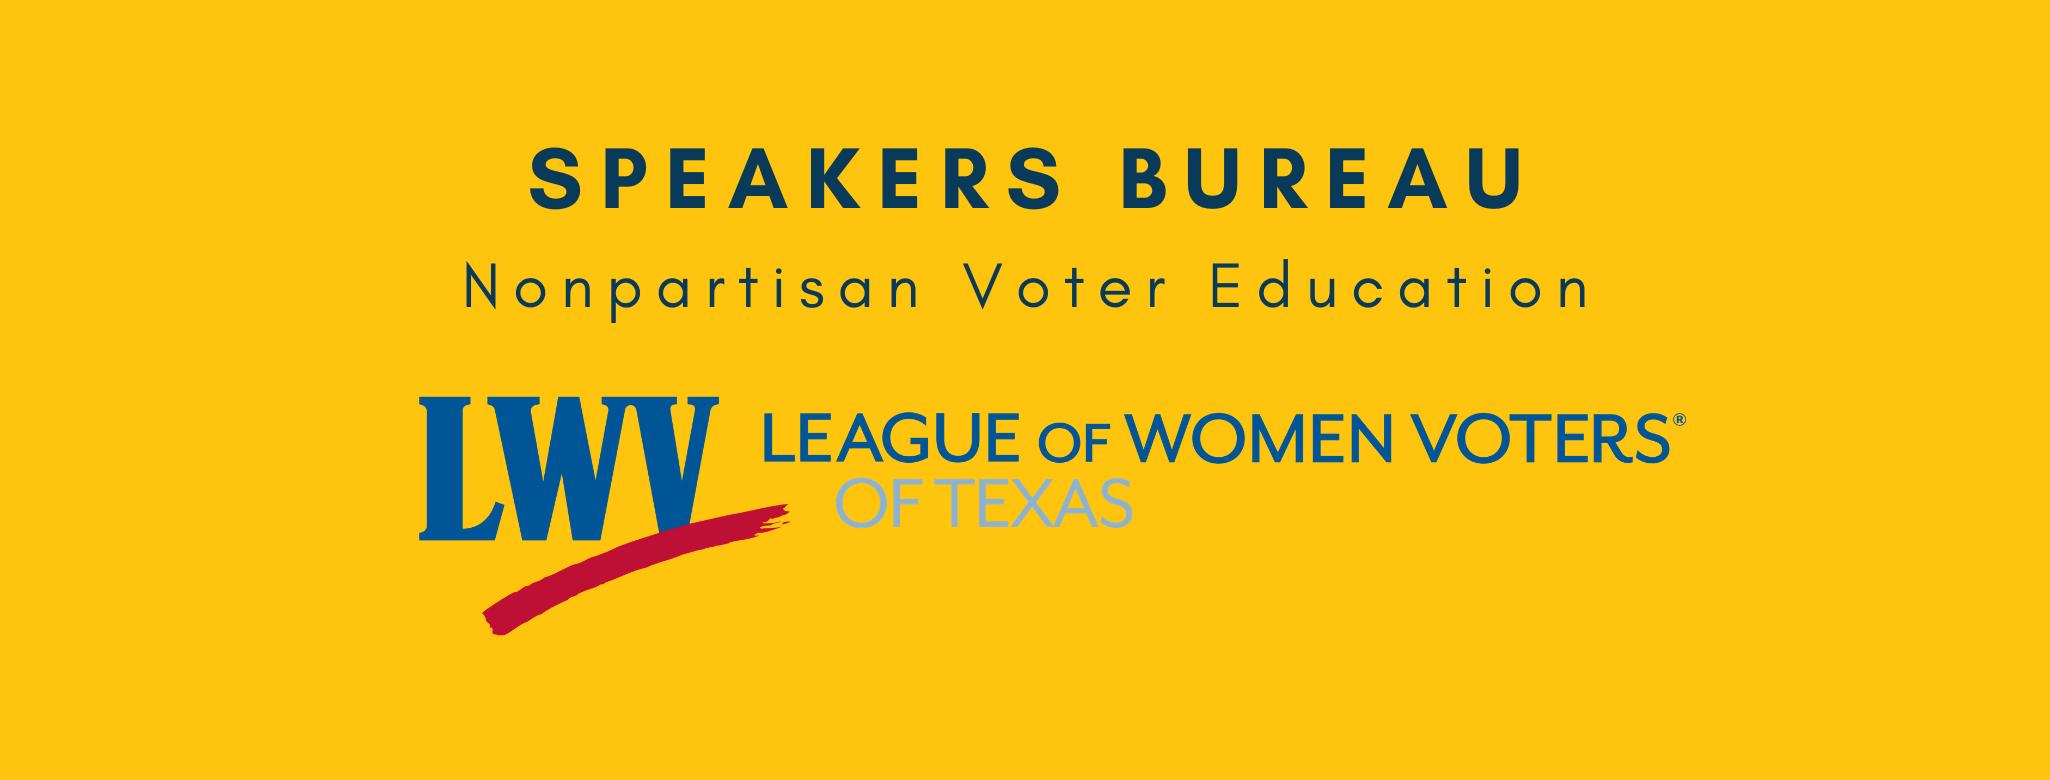 Speakers Bureau; nonpartisan voter education